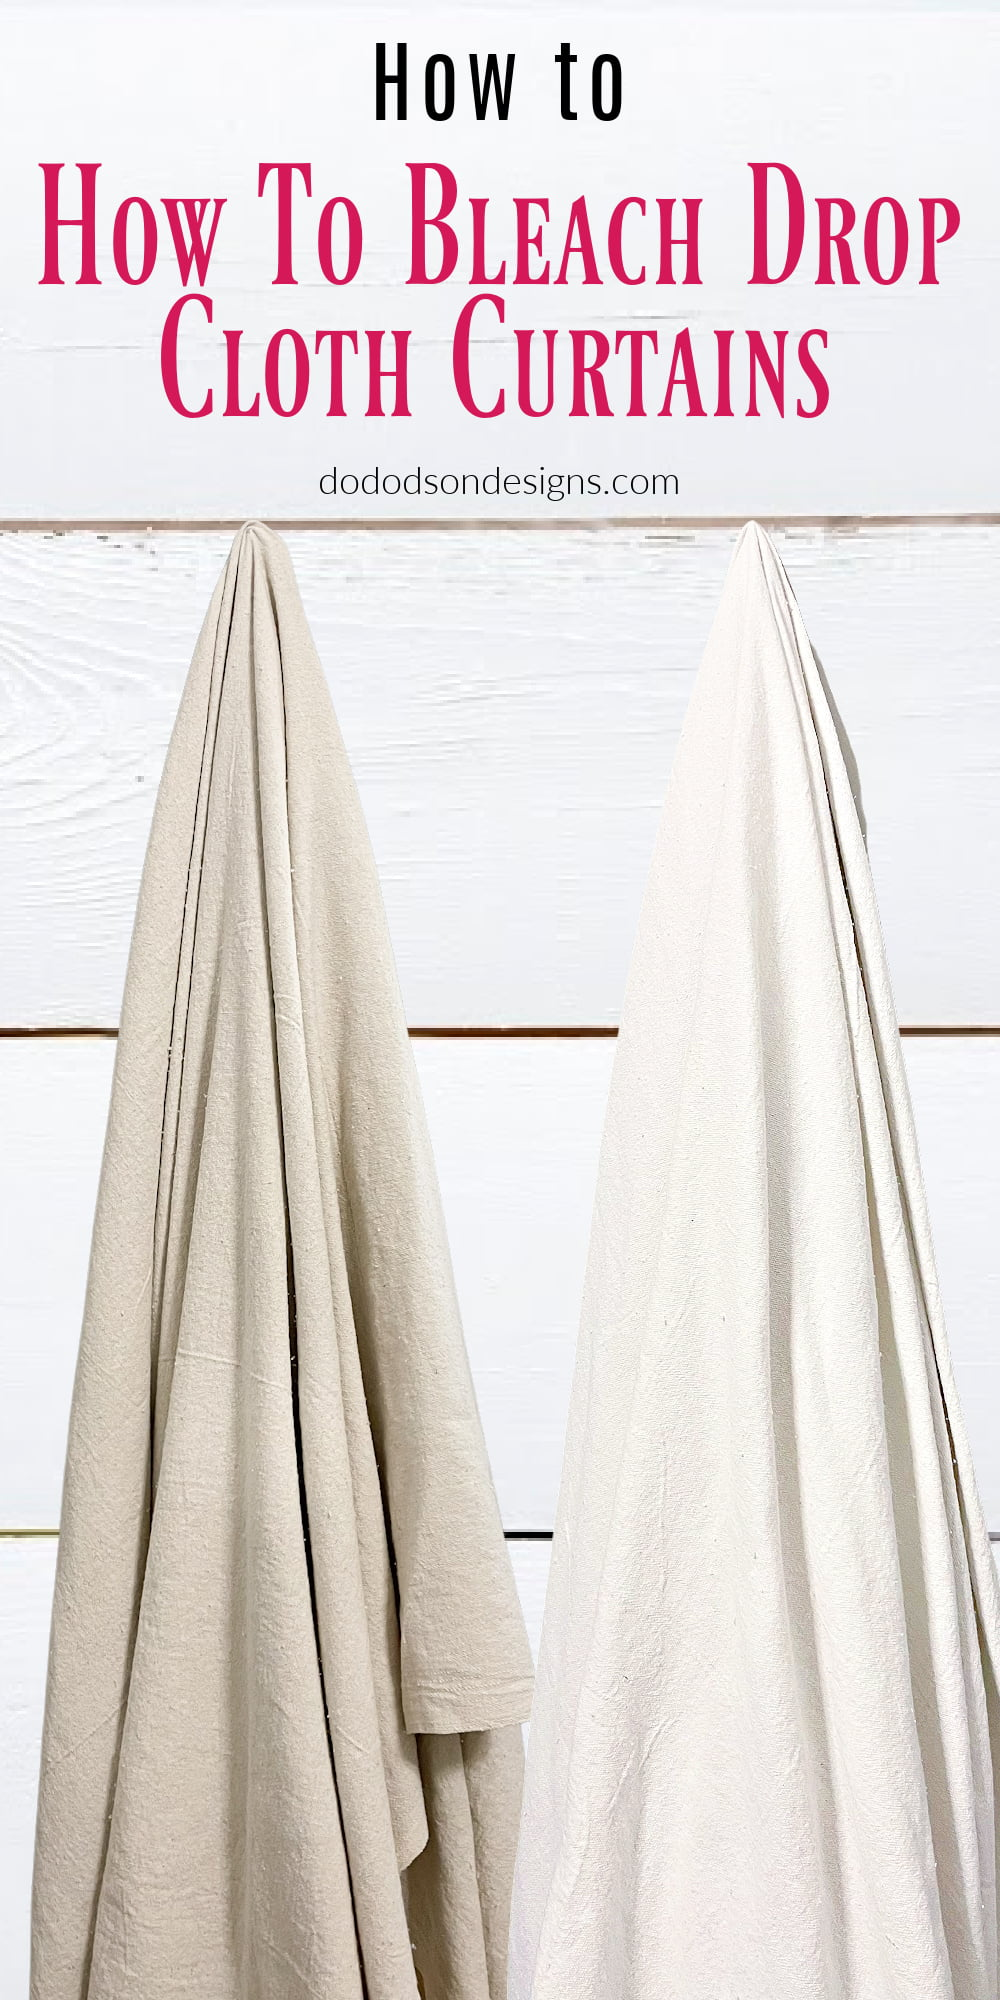 How To Bleach Drop Cloths For Curtains